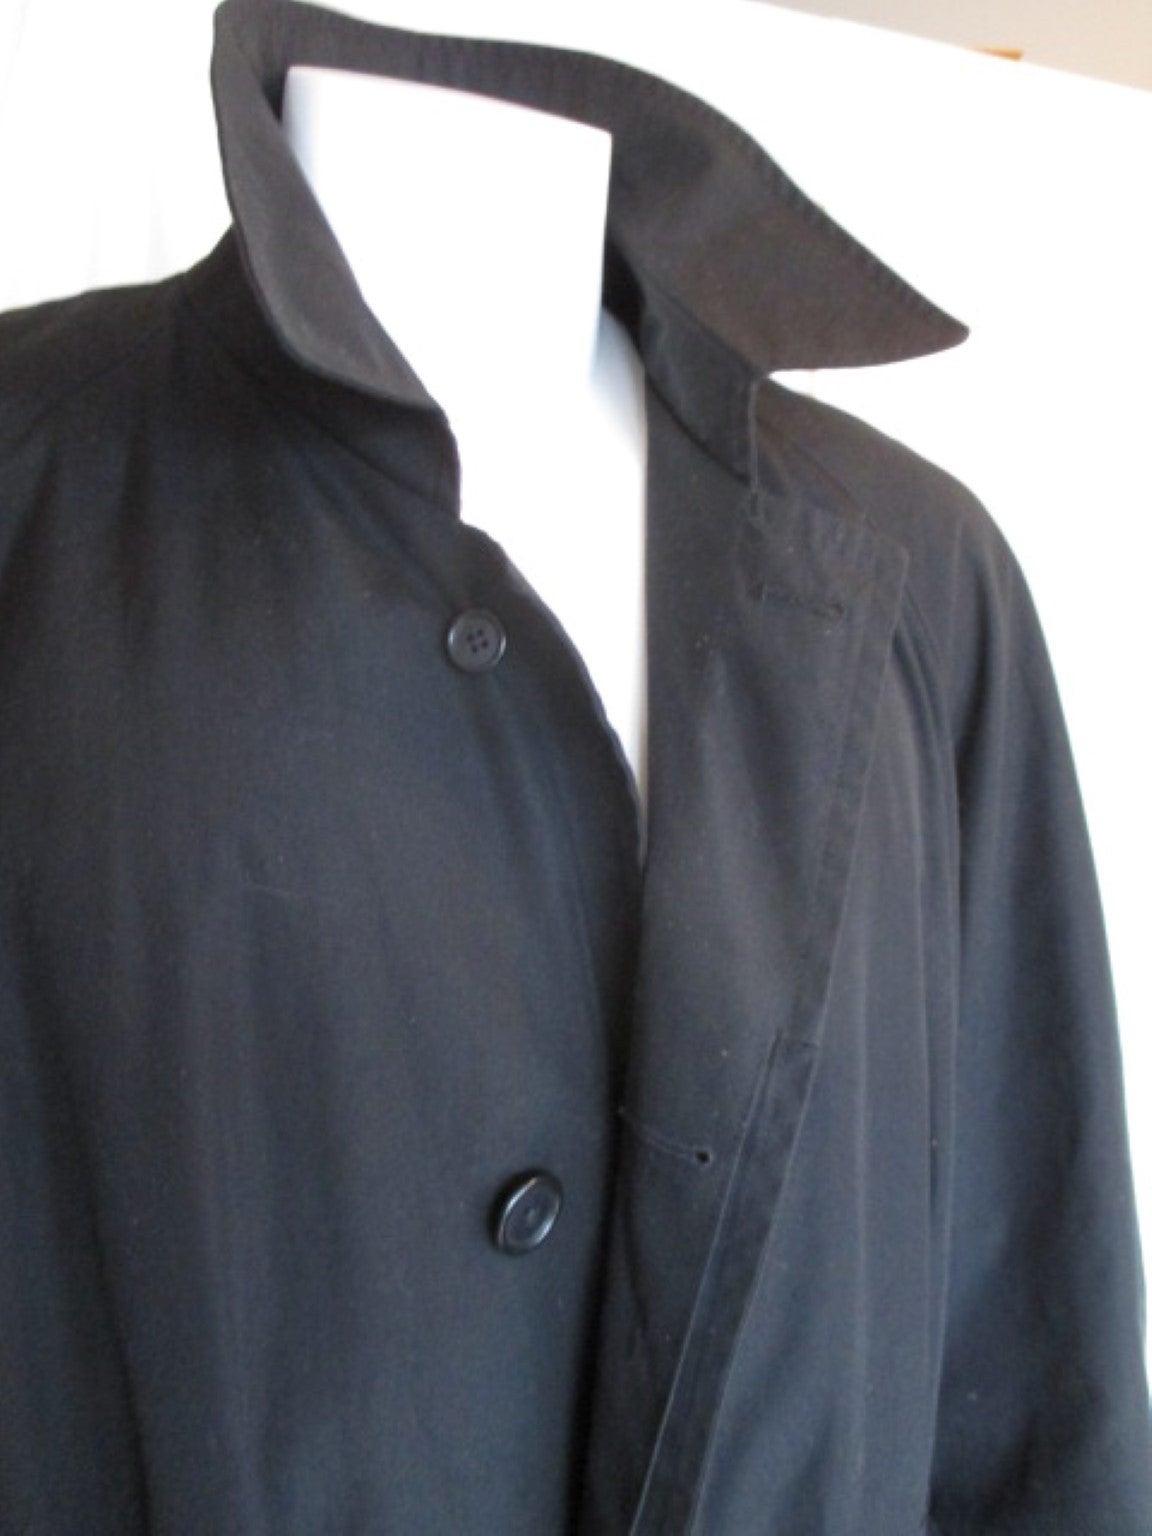 Christian Dior black men's topcoat 3